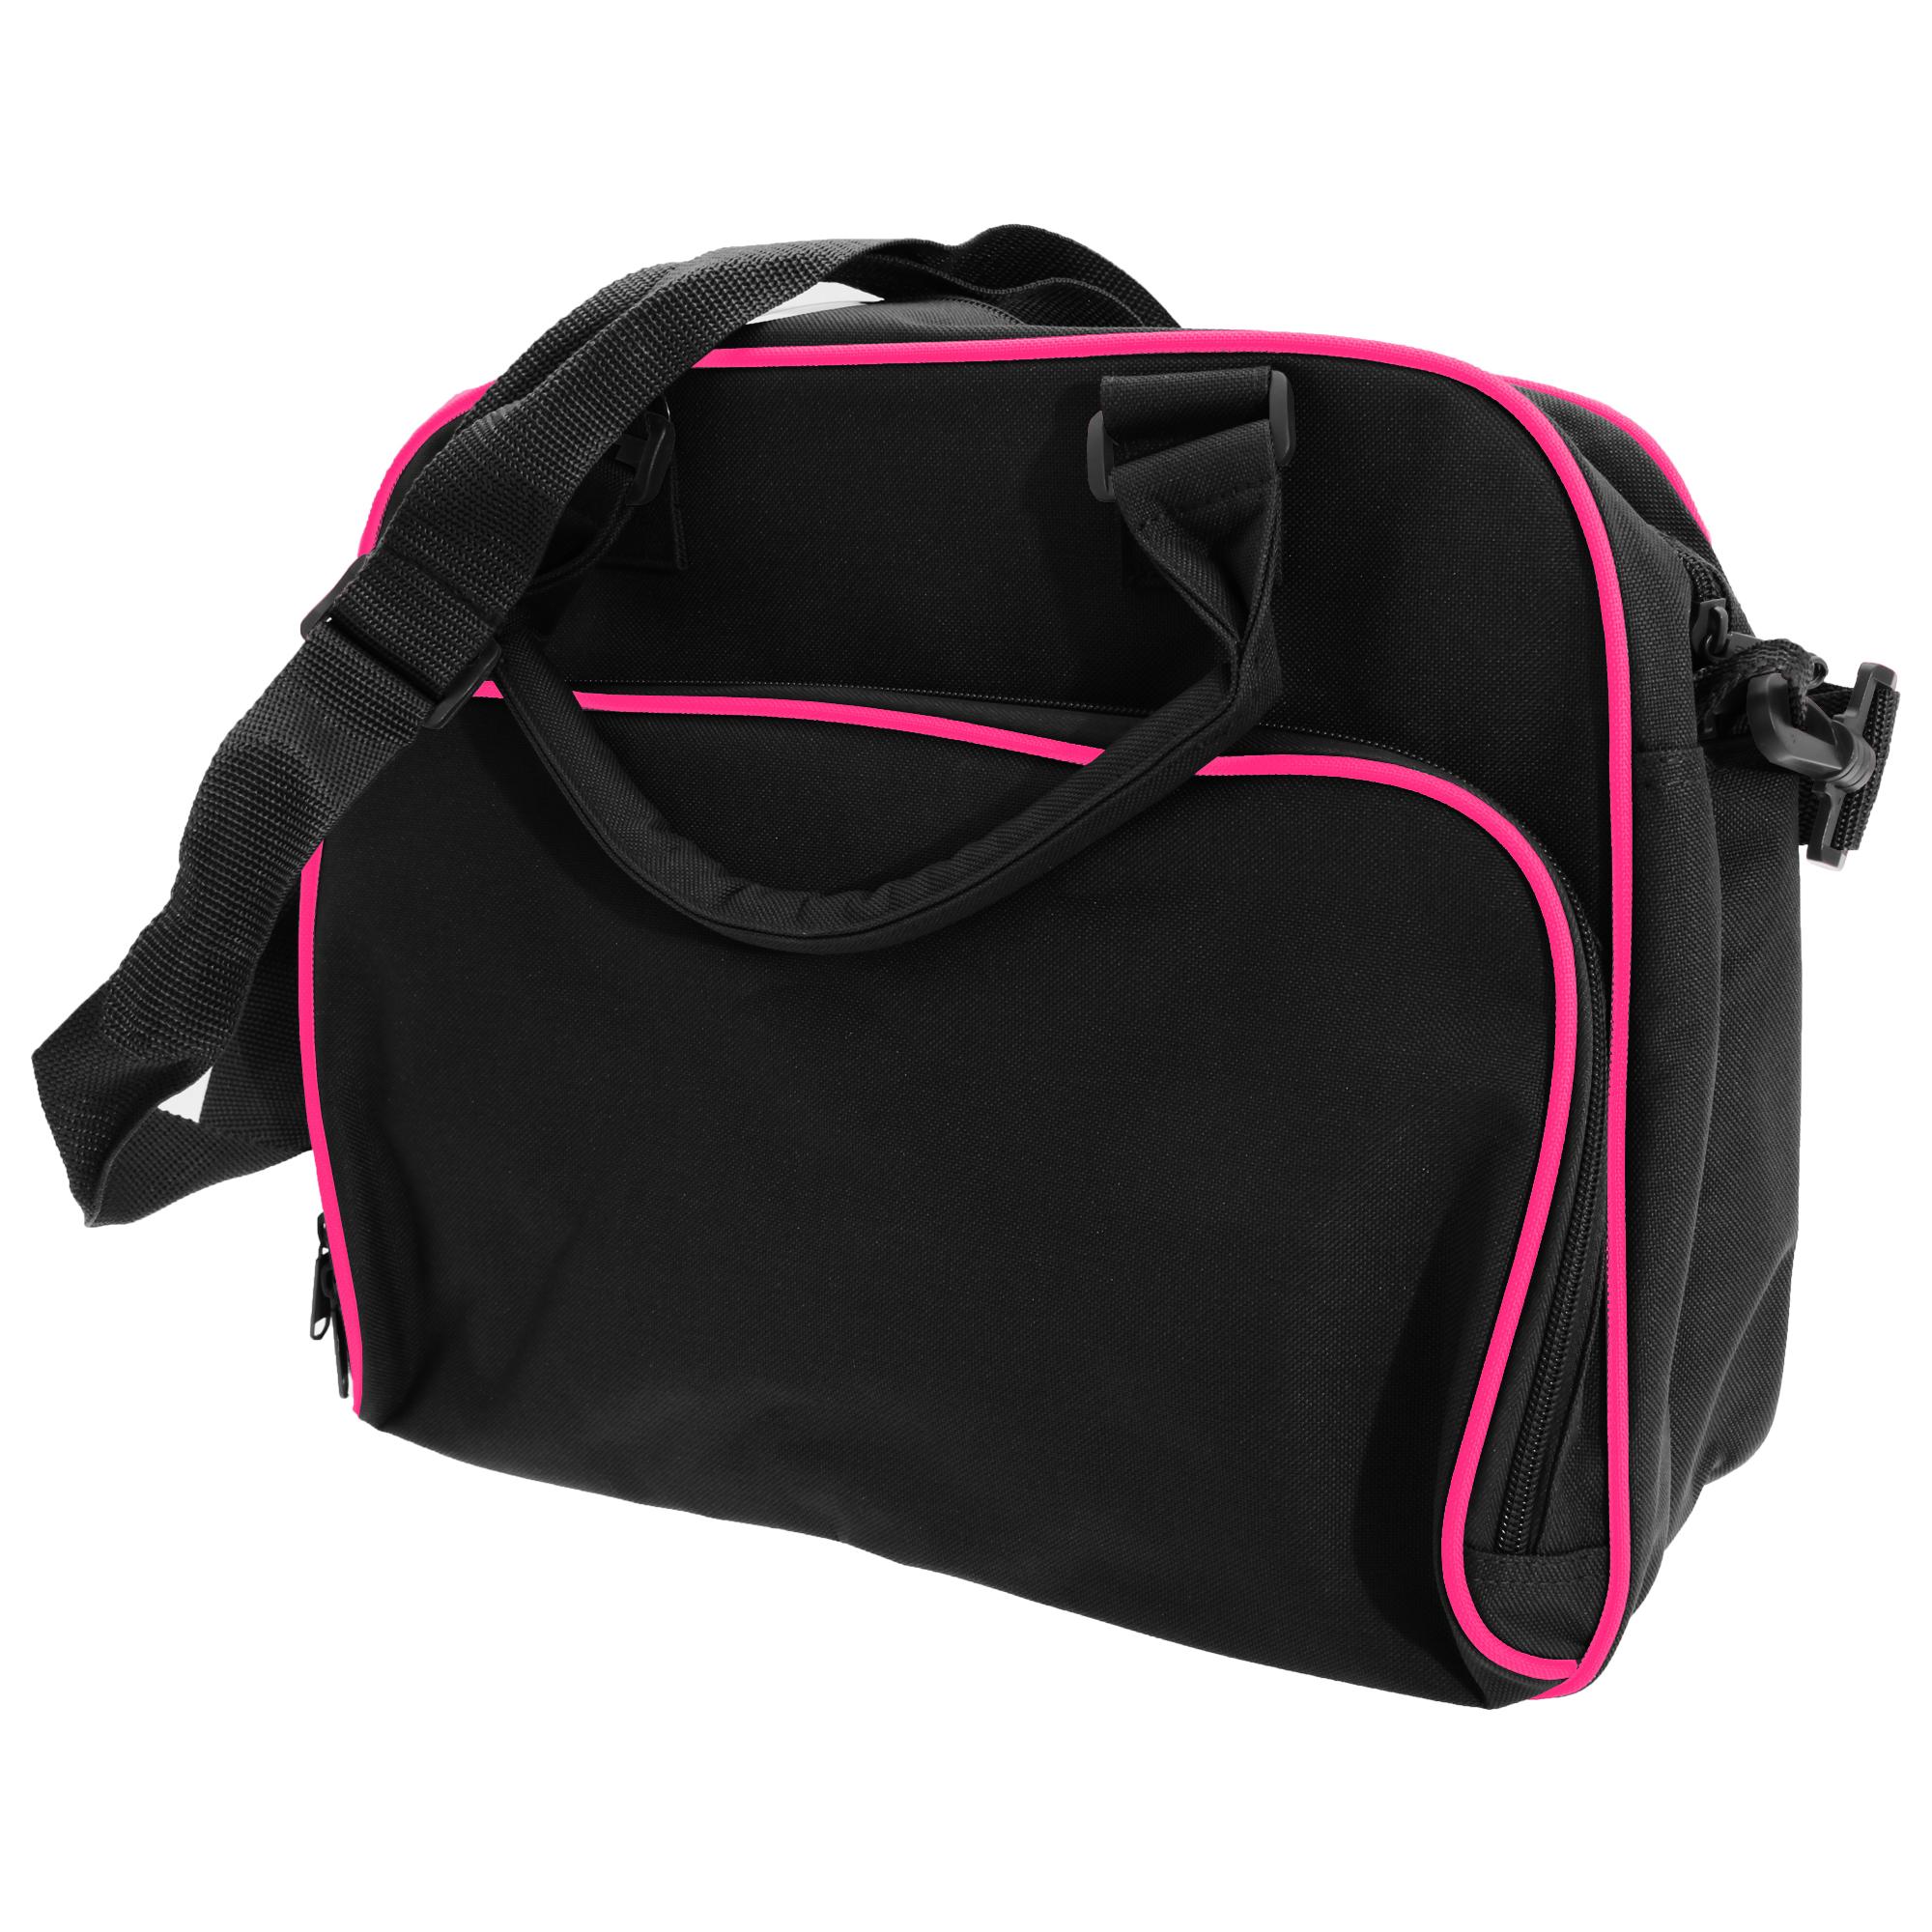 Bagbase Compact Junior Dance Messenger Bag (15 Litres) (One Size) (Black/Fuchia)